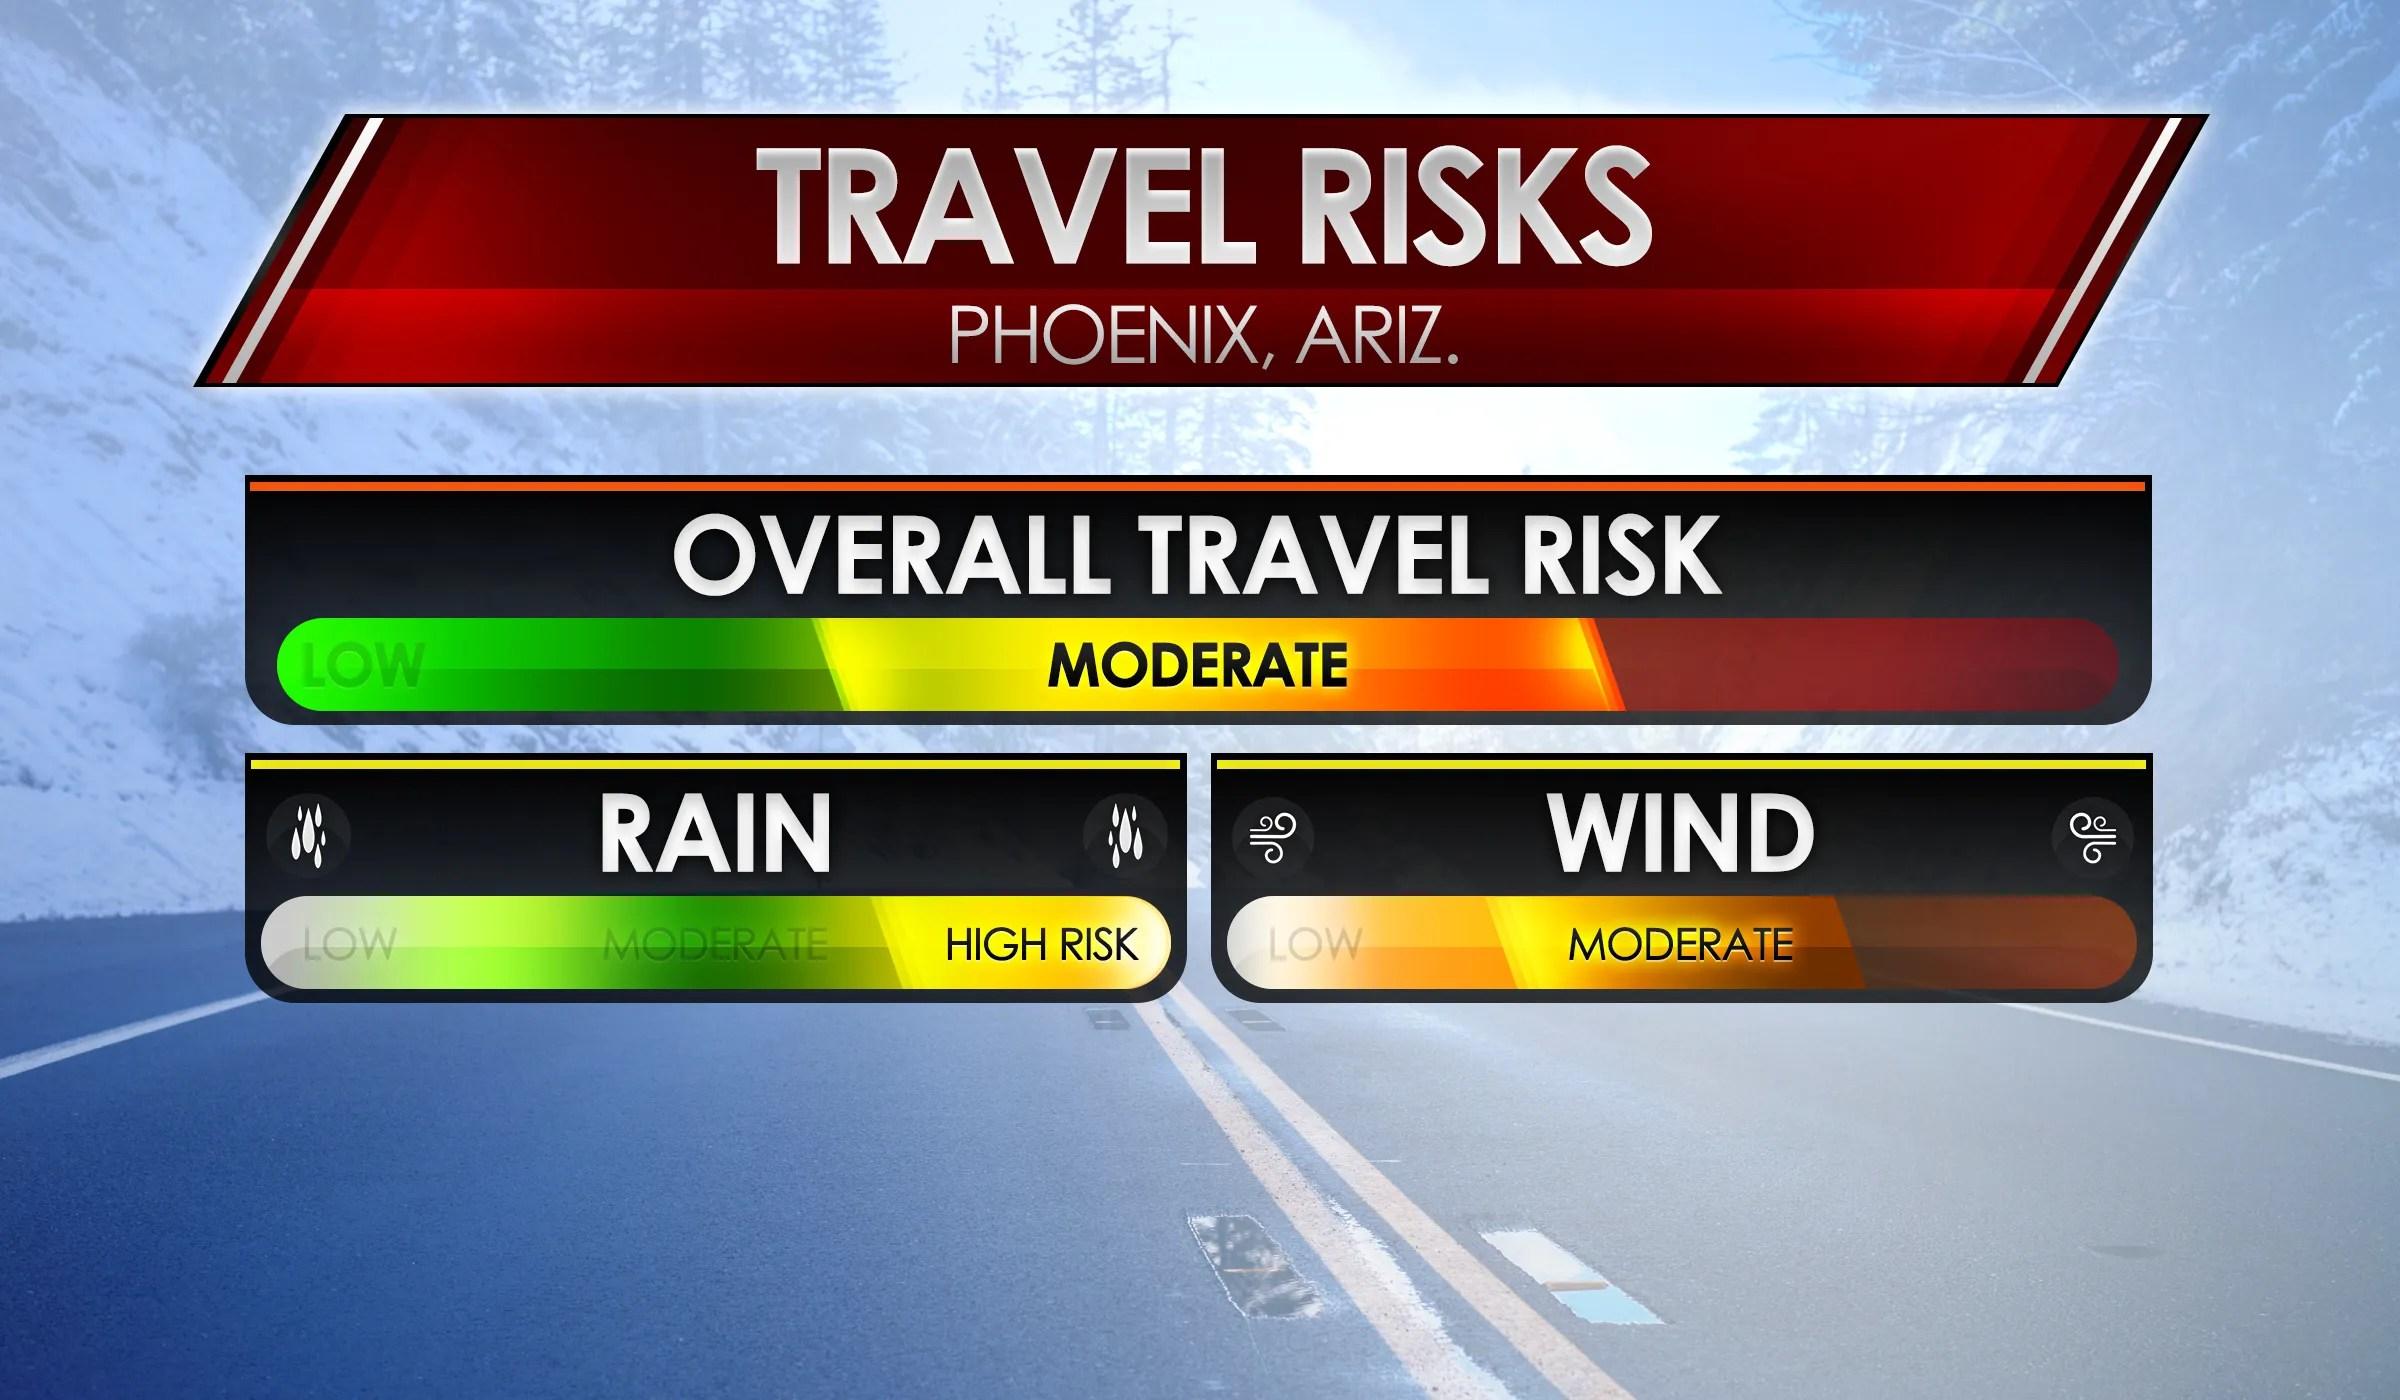 Travel Risk Phoenix